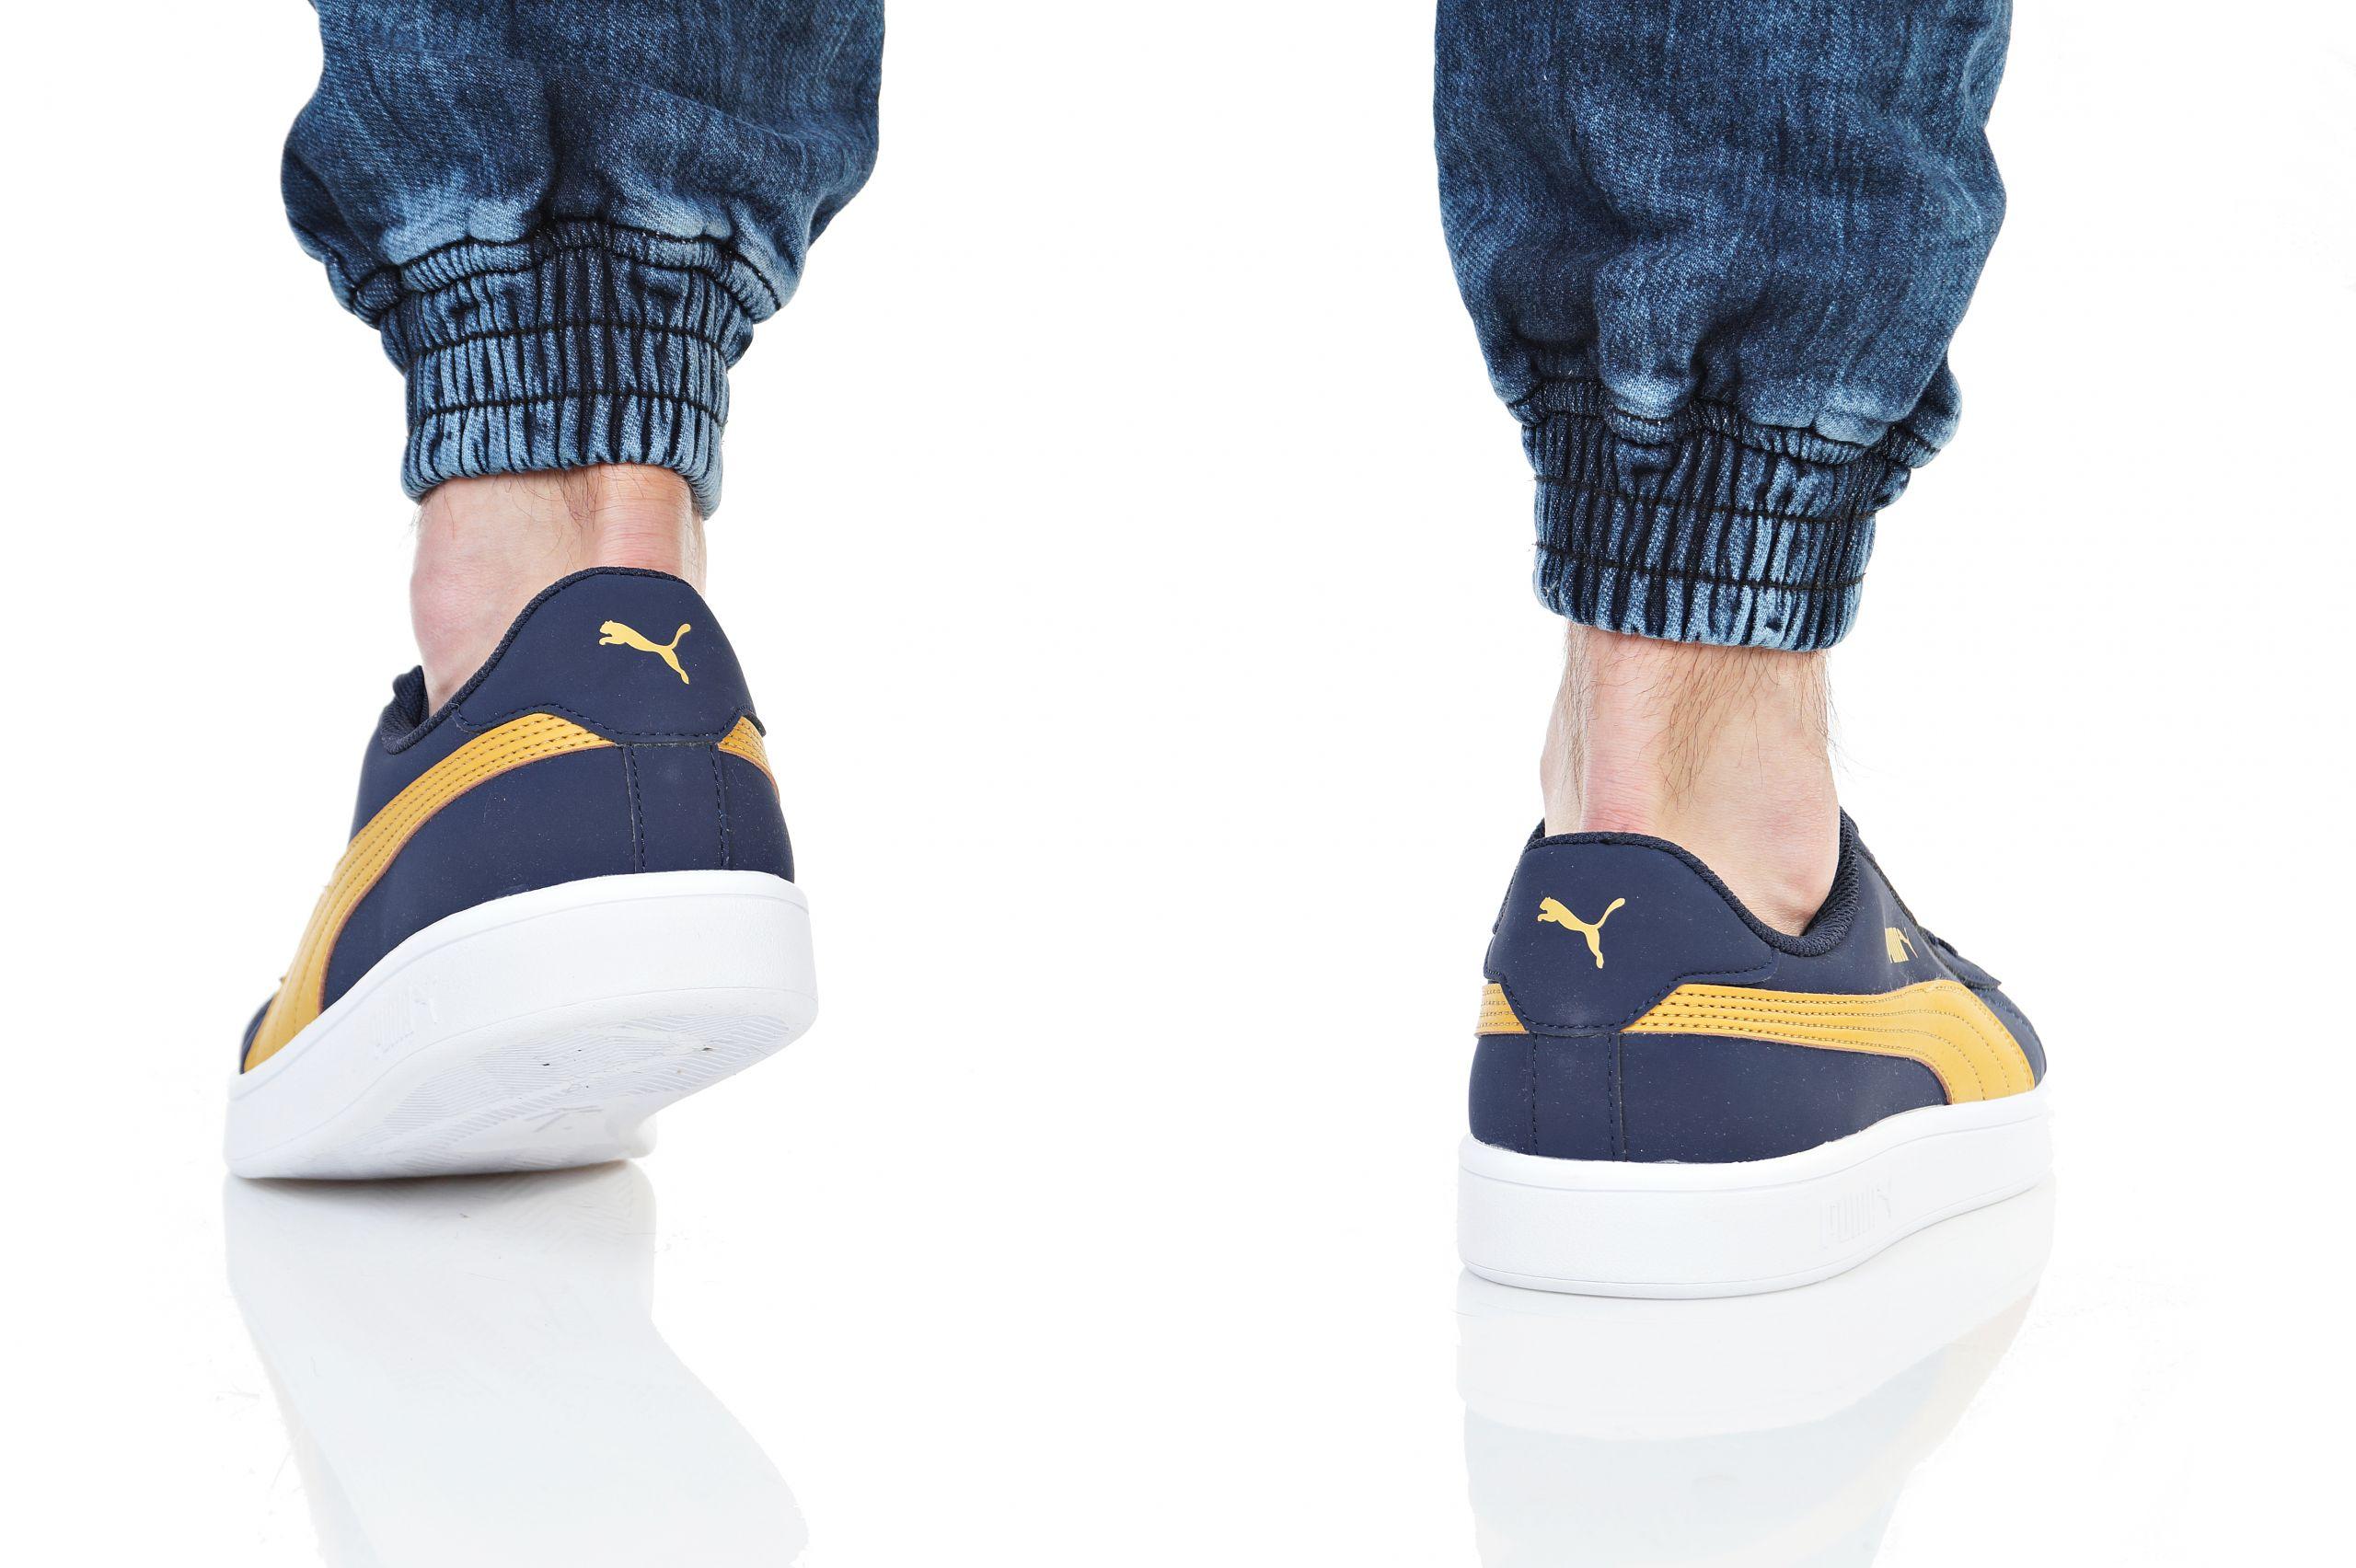 Puma Scarpe Sneakers Sportive Smash v2 Buck Peacoat Blu Nubuck Venta Barata Buscando VsYFwBbHp